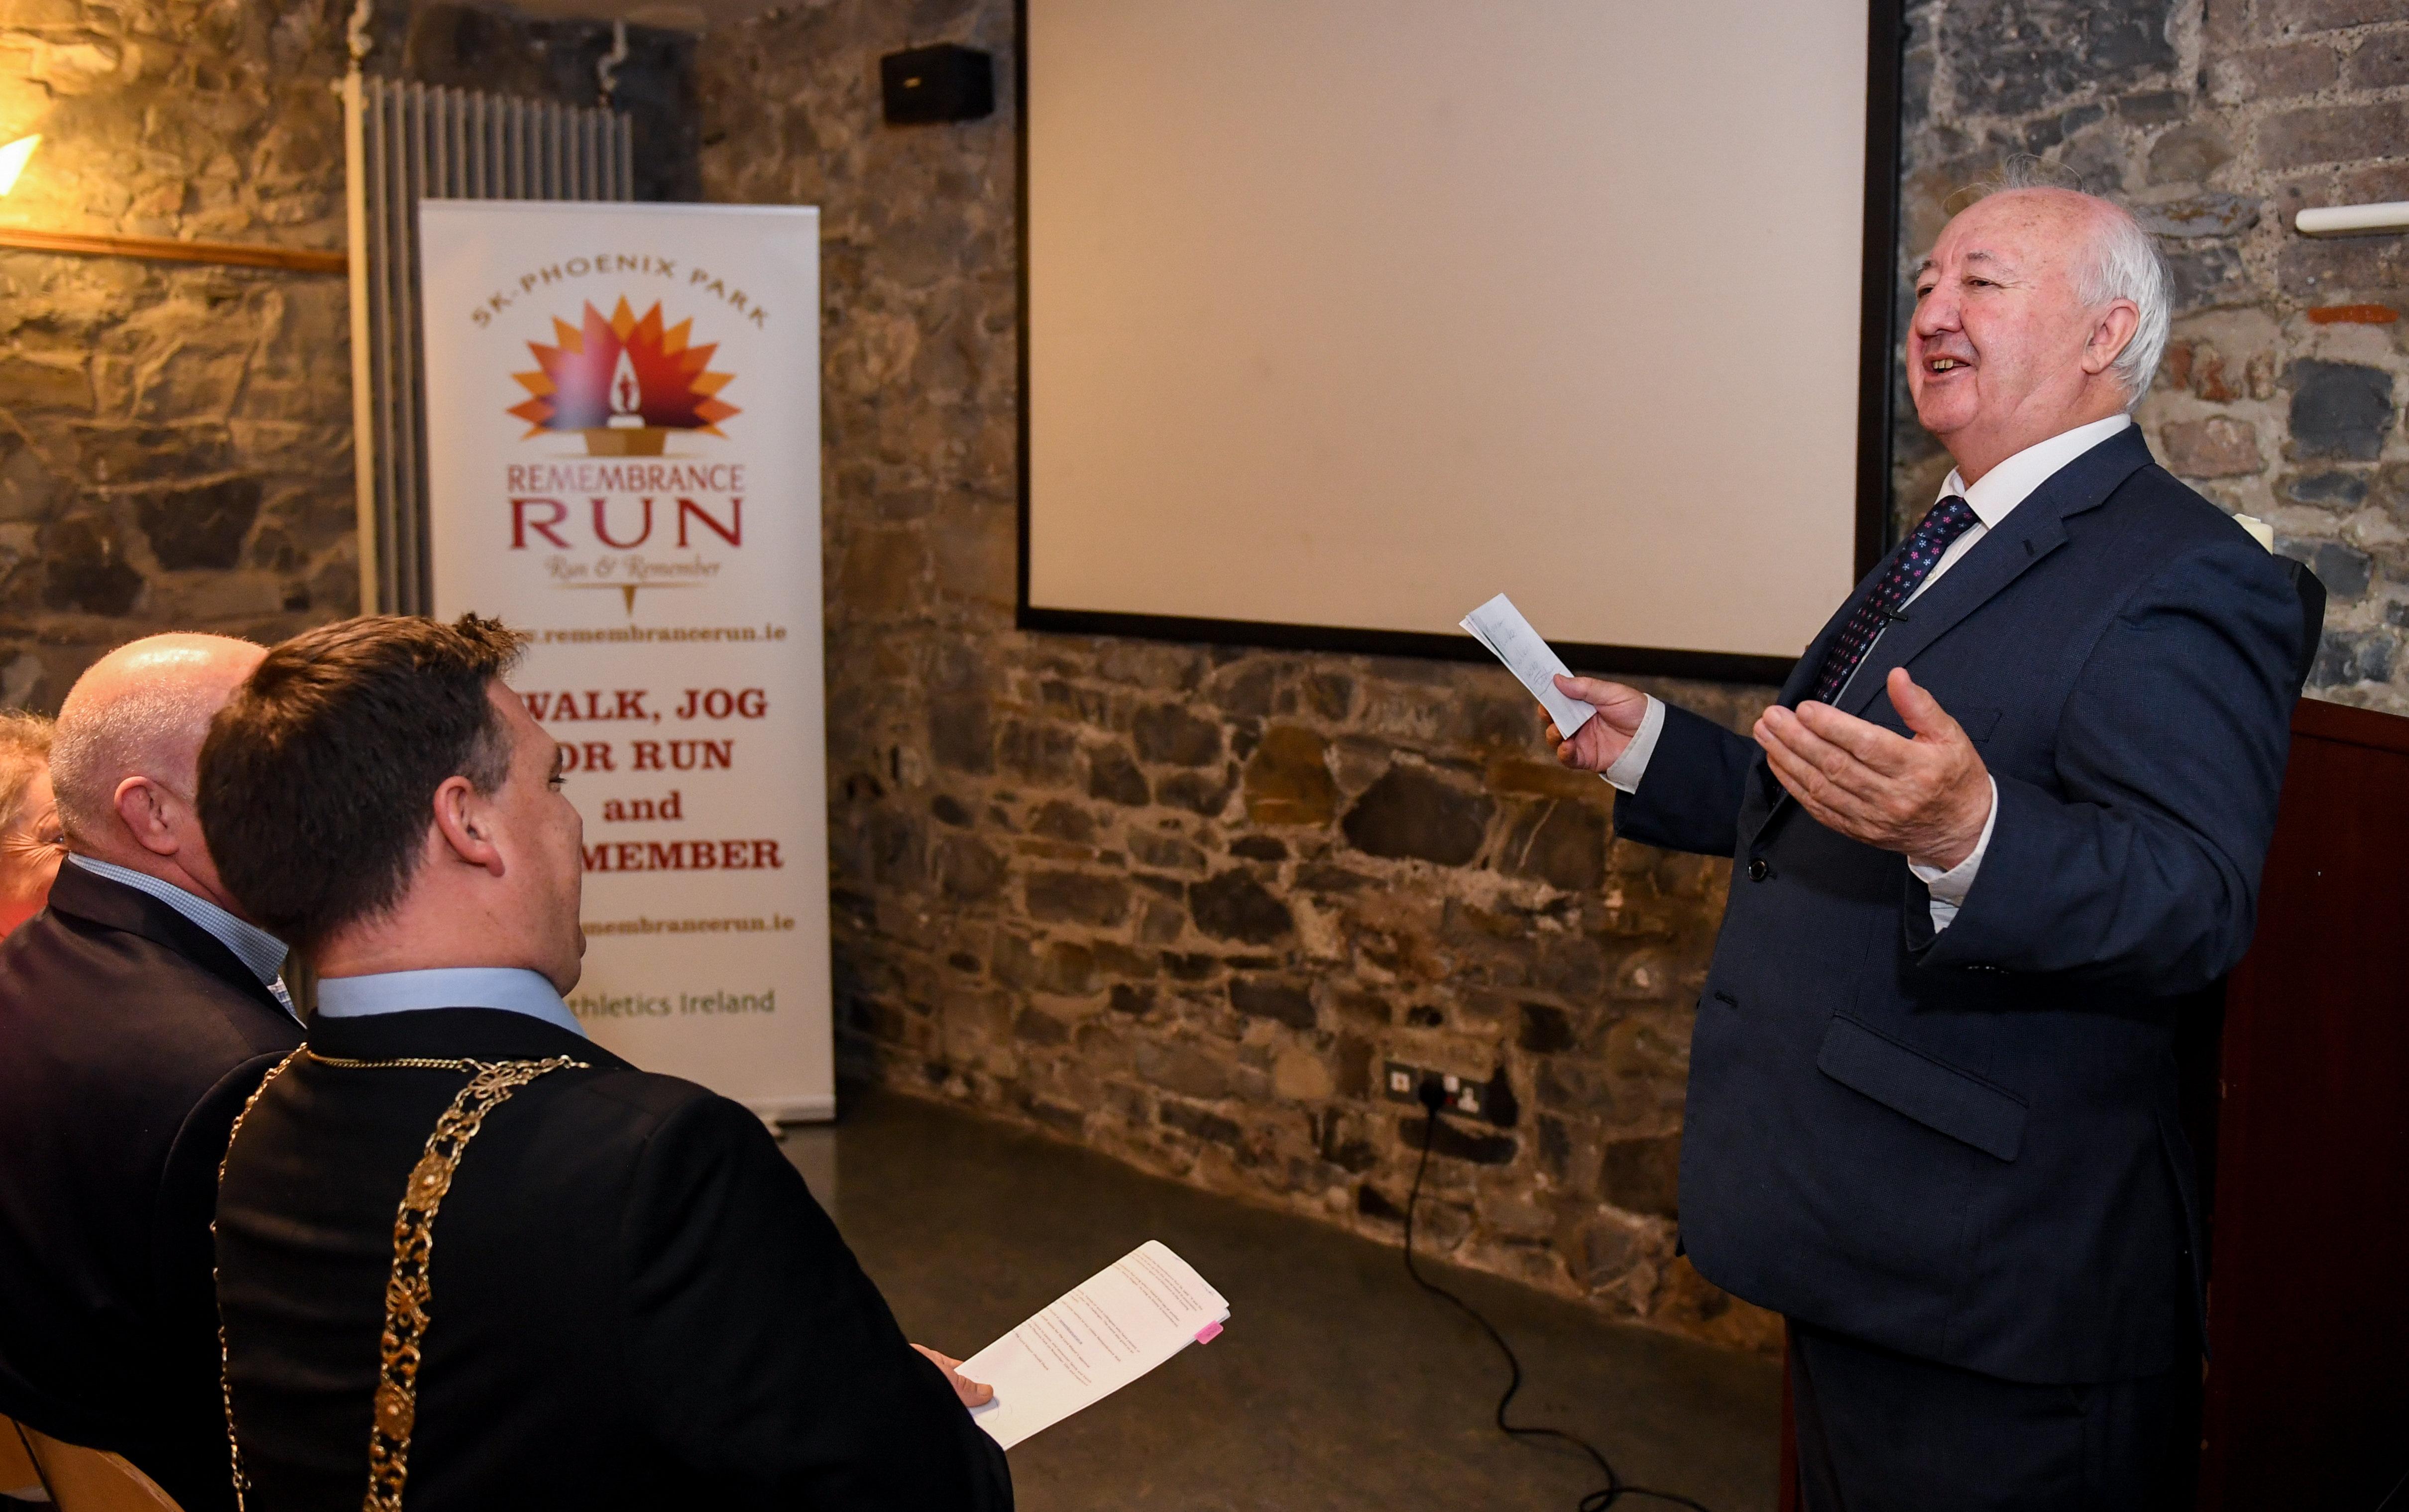 Remembrance Run 5K - November 10th, 2019 | Athletics Ireland